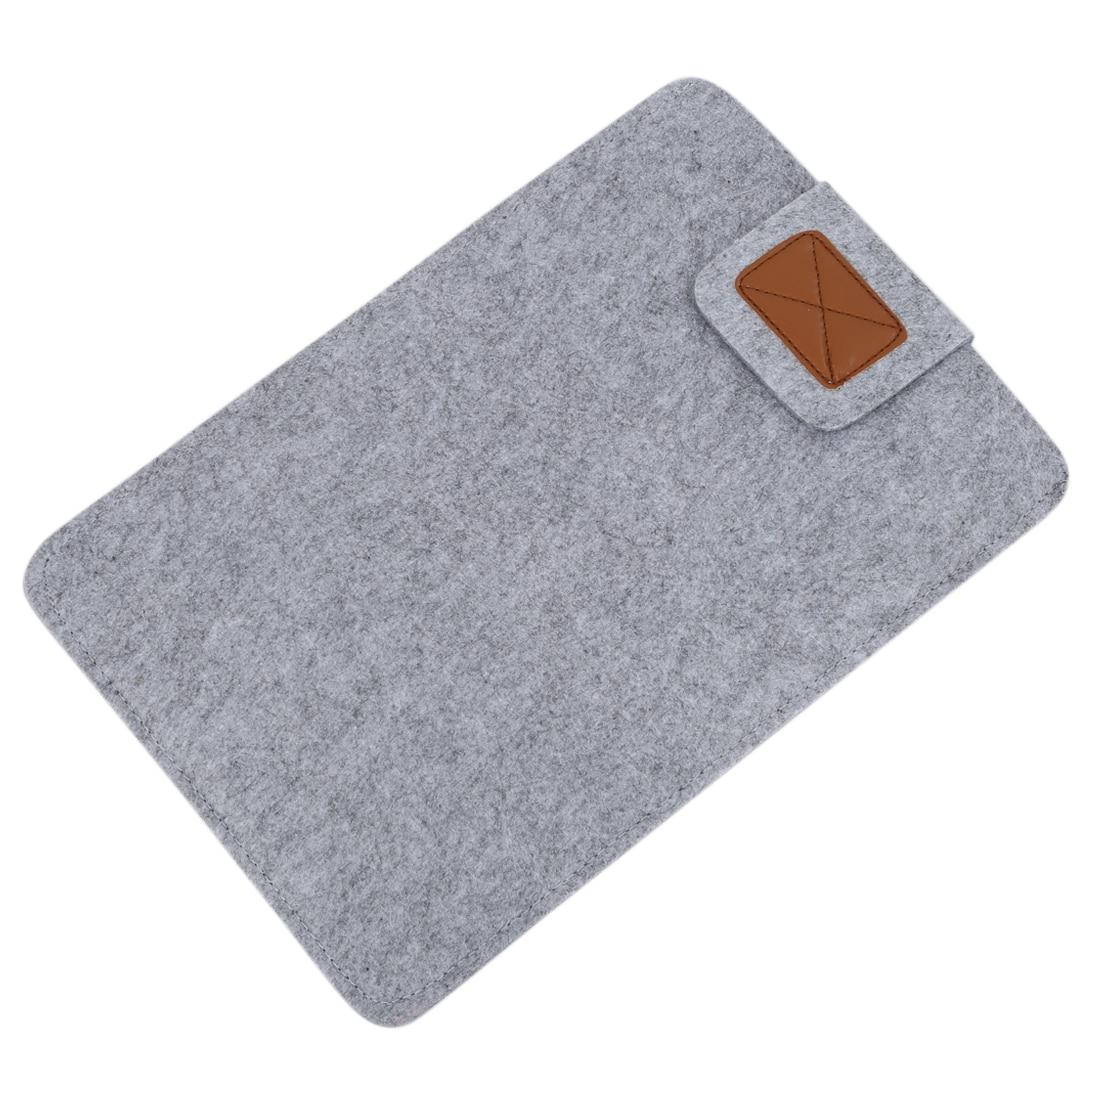 Funda de fieltro suave para PC, Macbook Air Ultrabook, portátil, Notebook, Tablet PC, gris, 13 pulgadas